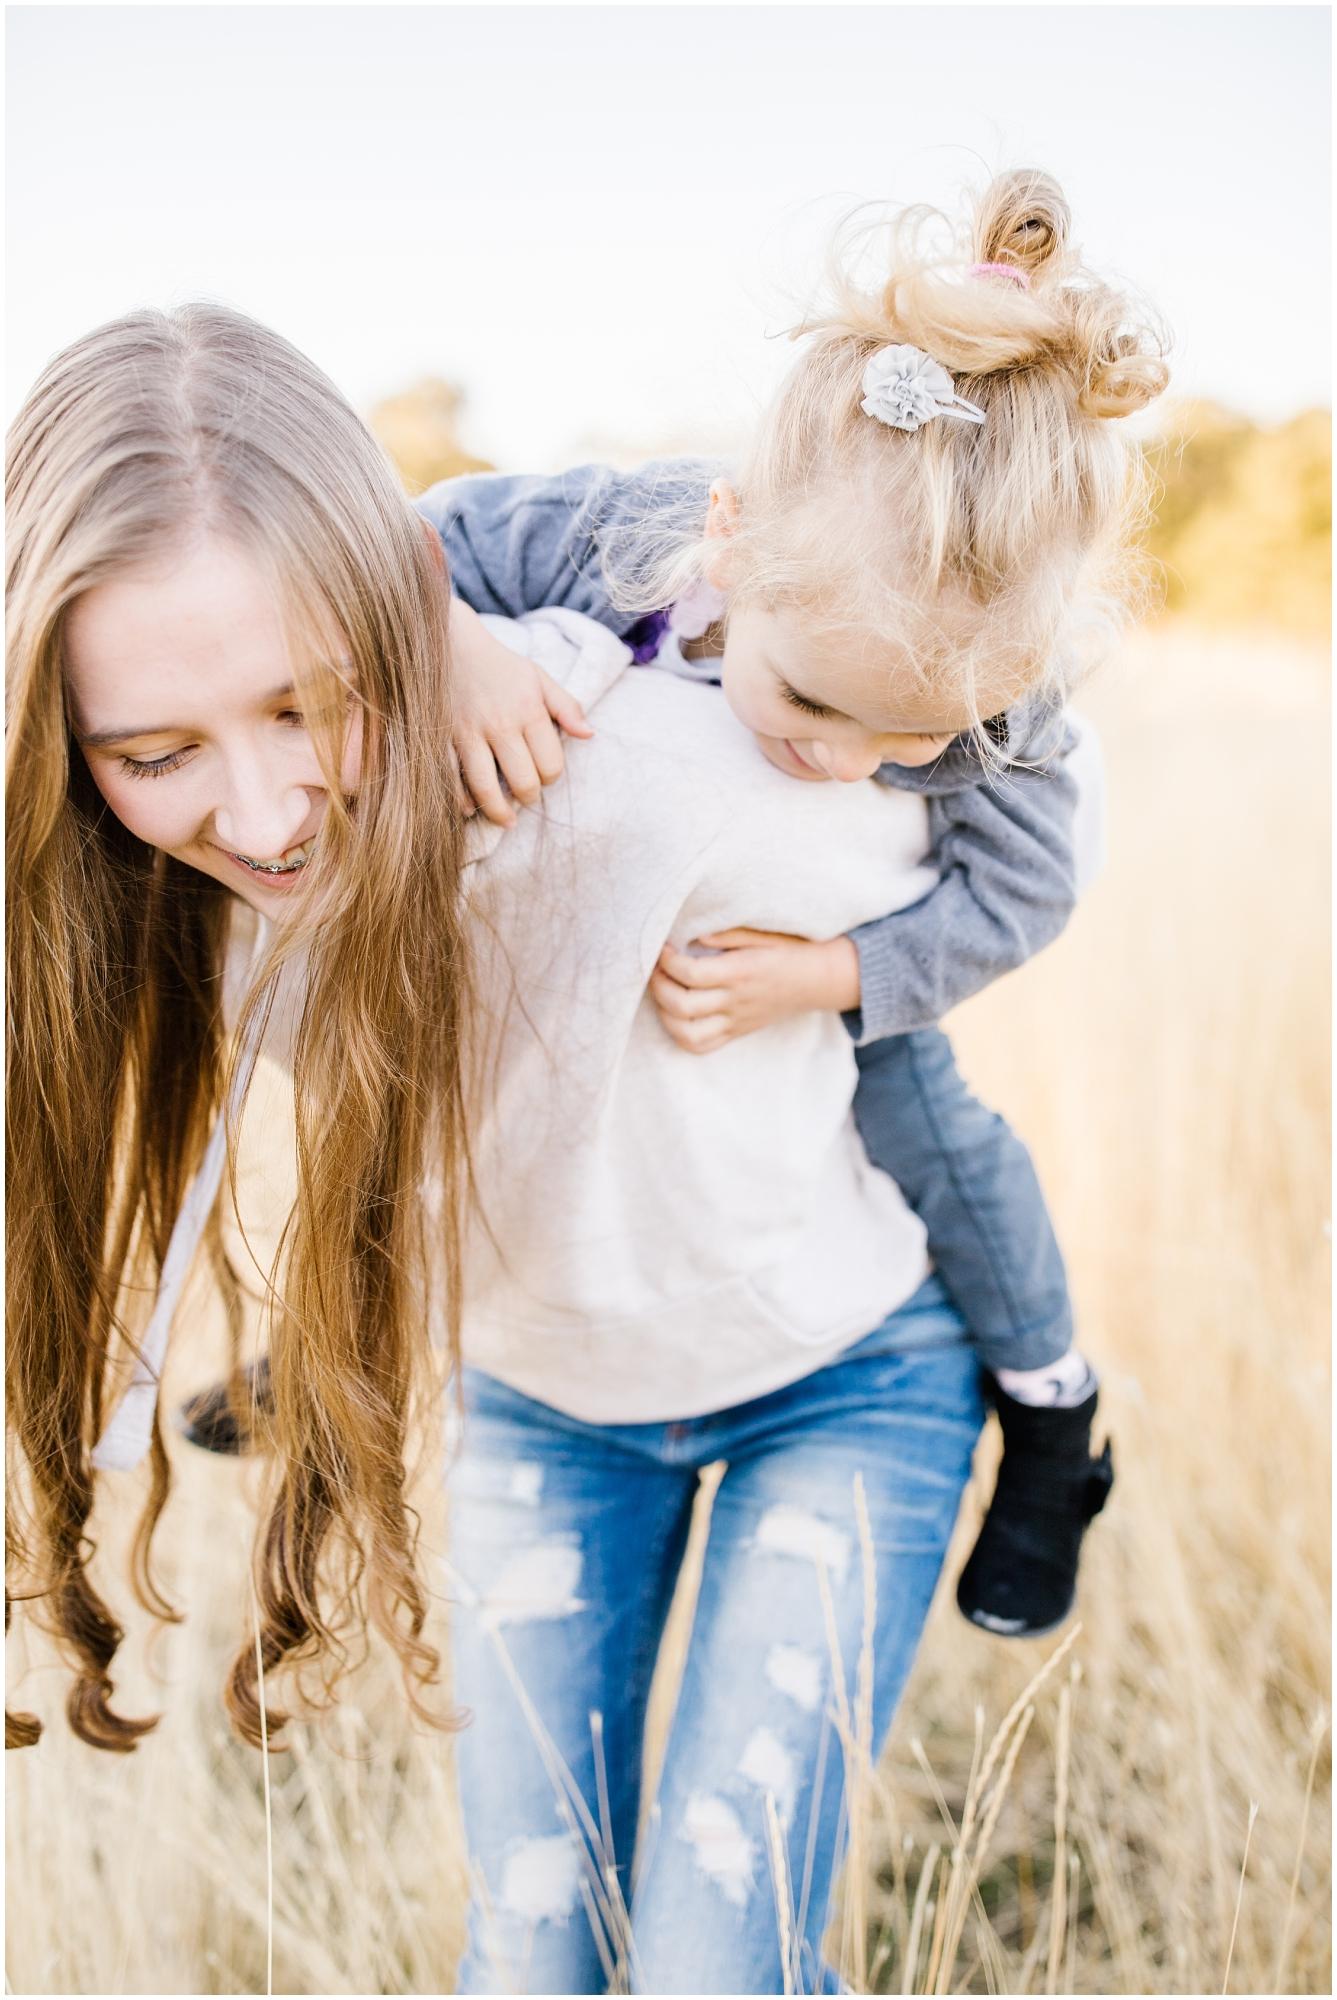 Jaursch-83_Lizzie-B-Imagery-Utah-Family-Photographer-Park-City-Salt-Lake-City-Herriman-Utah.jpg